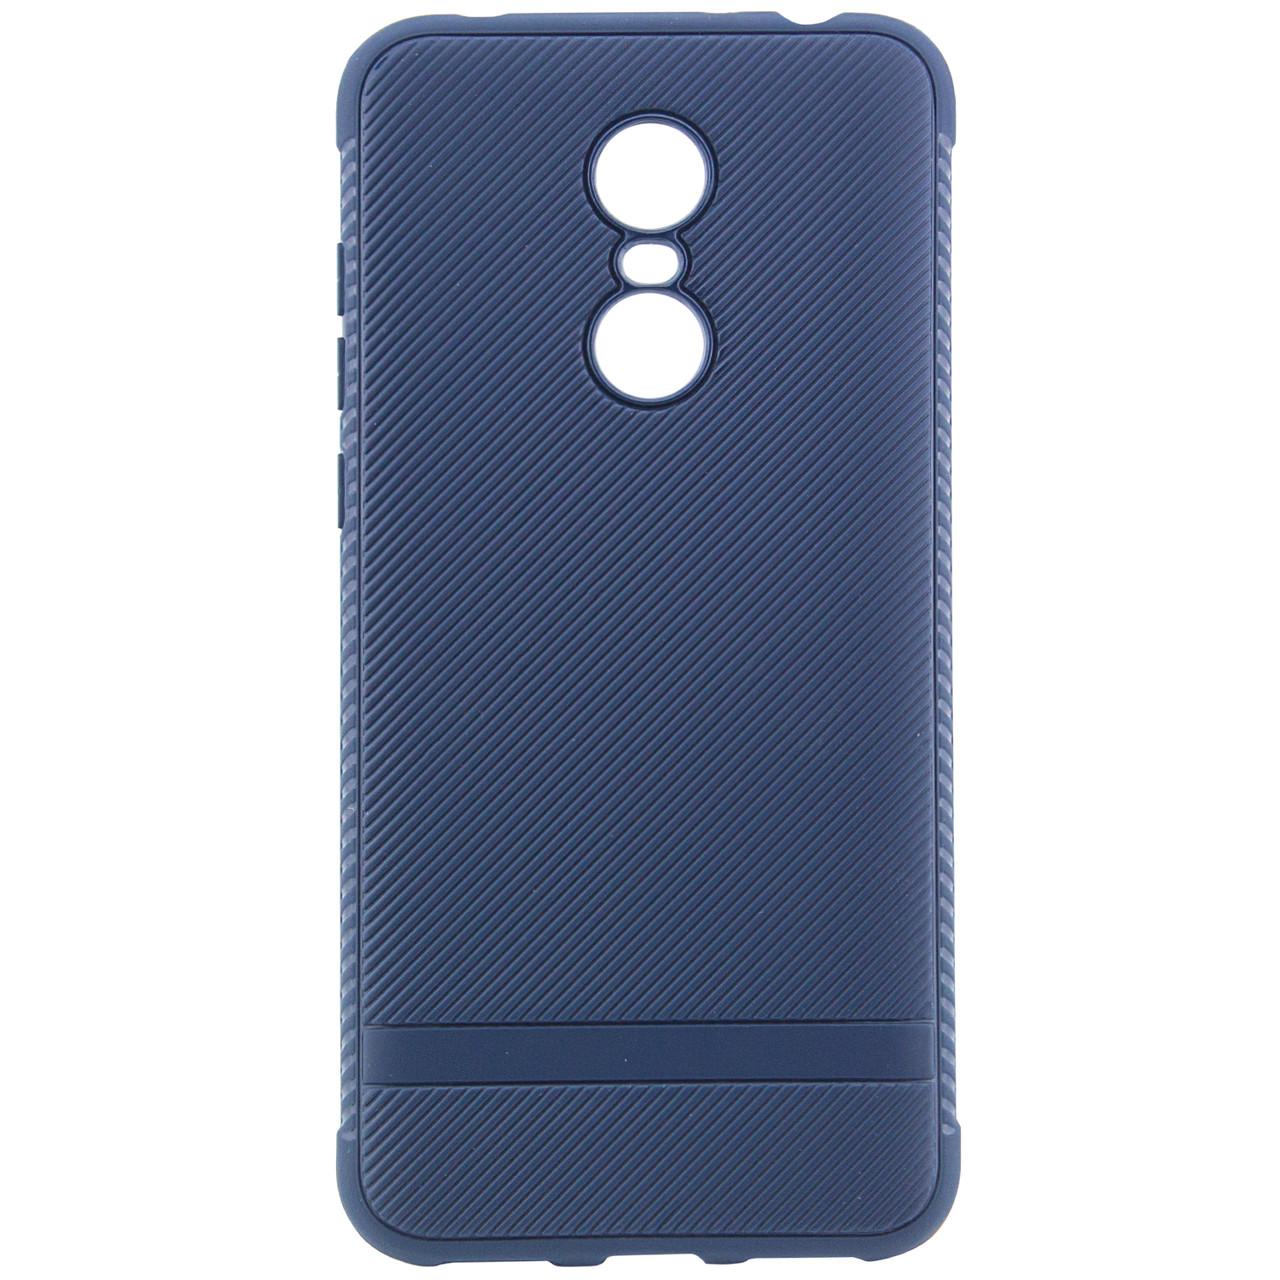 TPU чехол Stylish Series для Xiaomi Redmi 5 Plus / Redmi Note 5 (SC)